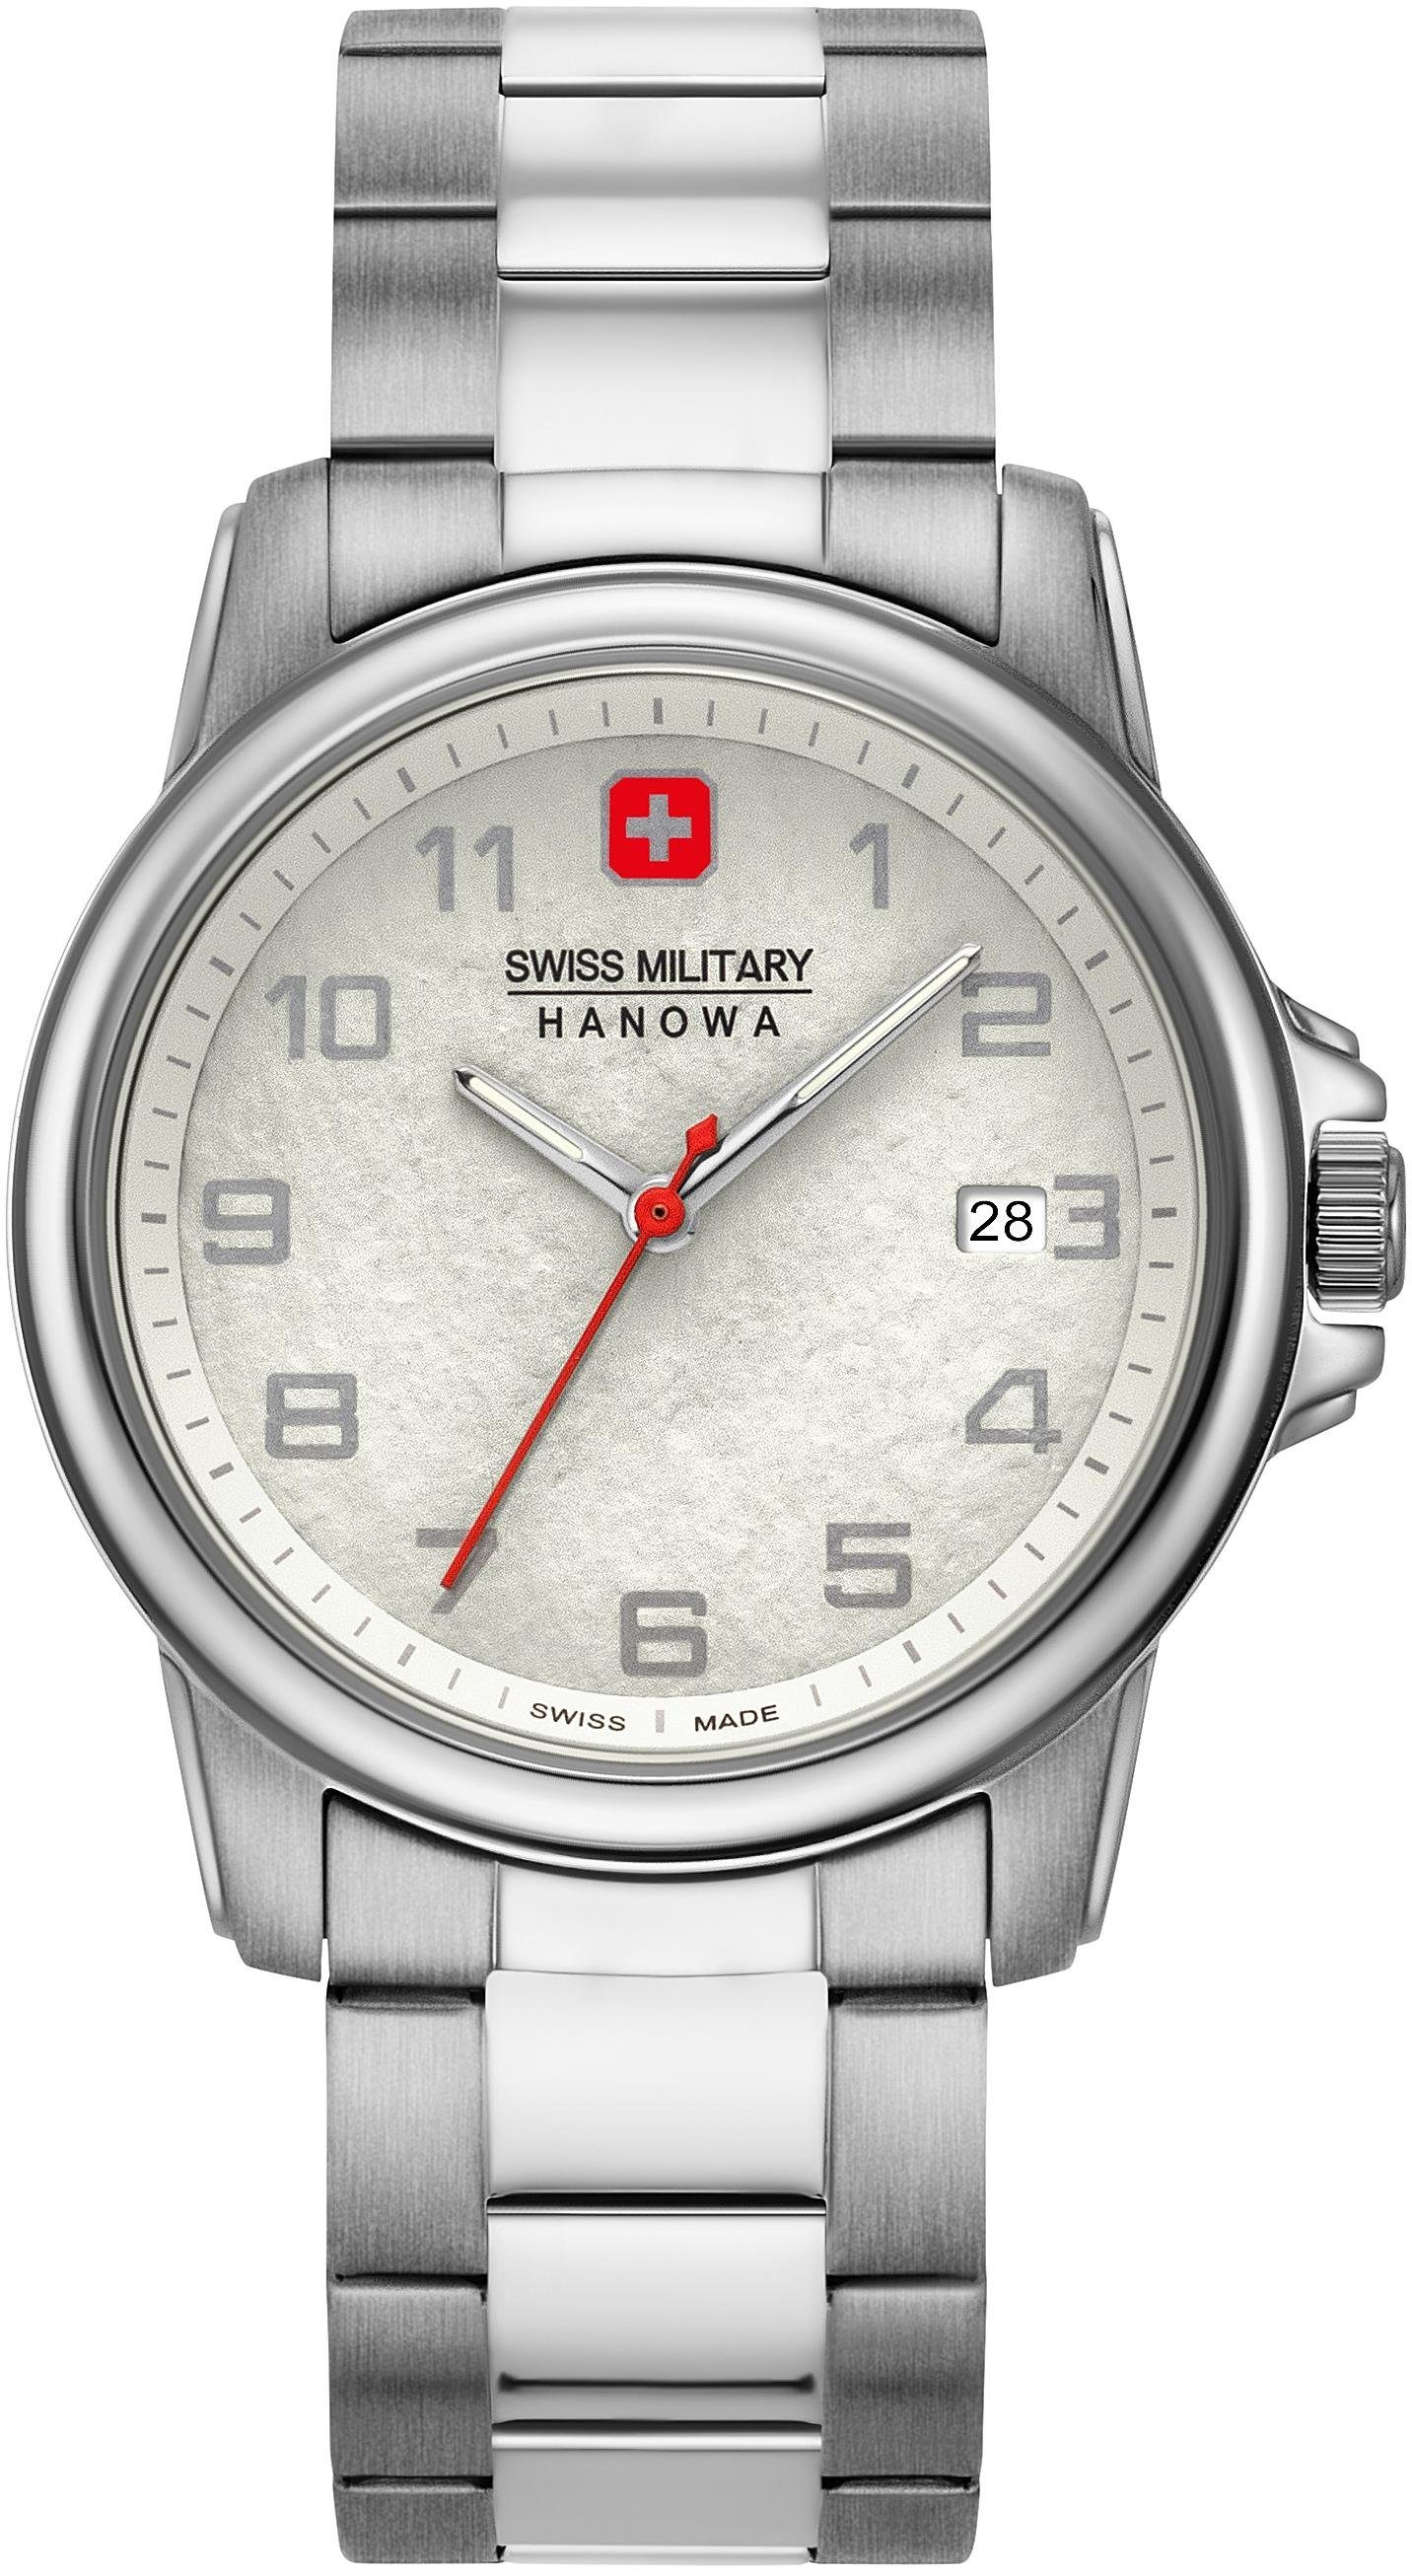 Swiss Military Hanowa Schweizer Uhr SWISS ROCK, 06-5231.7.04.001.10 | Uhren > Schweizer Uhren | Swiss Military Hanowa